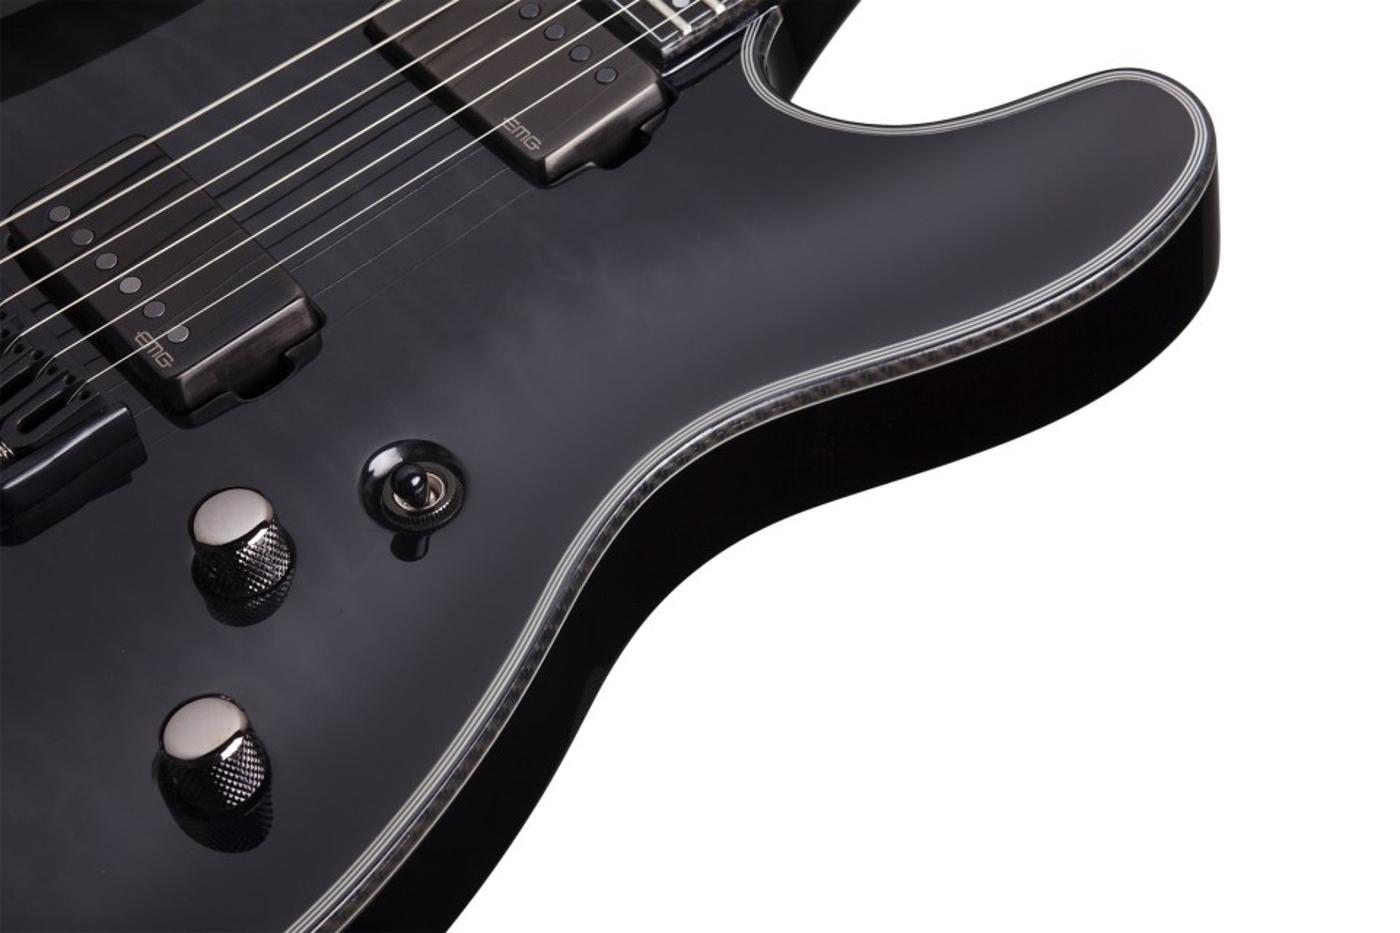 7 String Electric Guitar, Trans Black Burst Finish